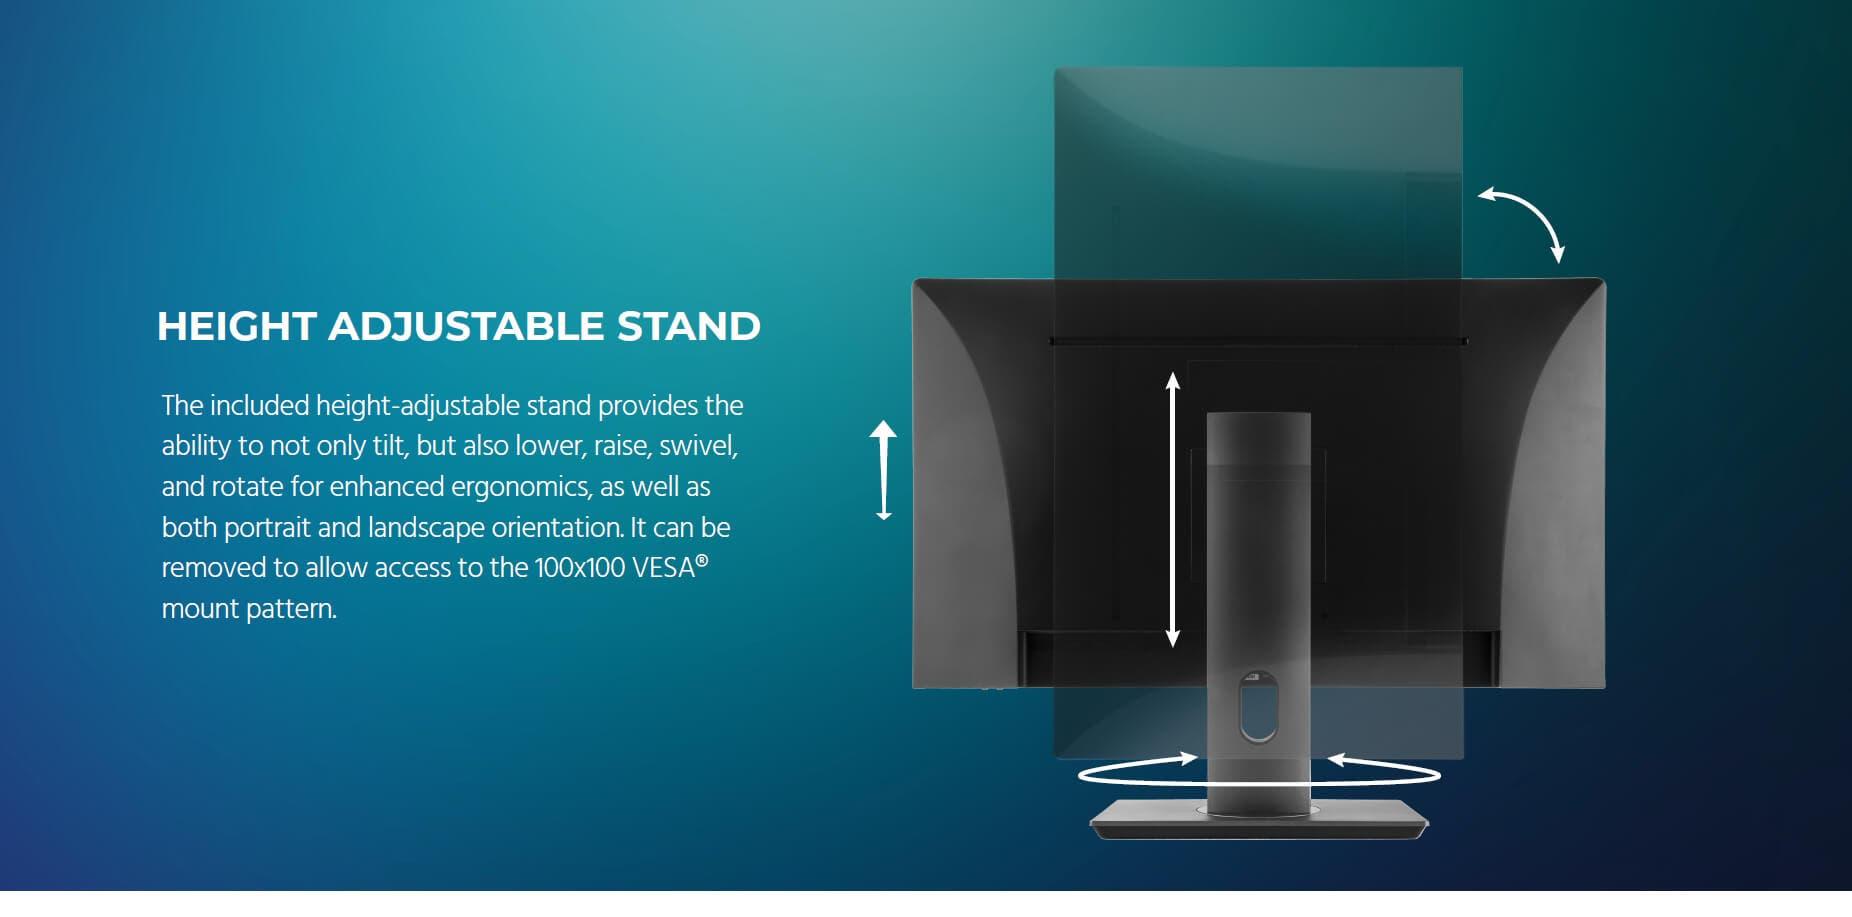 27-inch Vivid Monitor